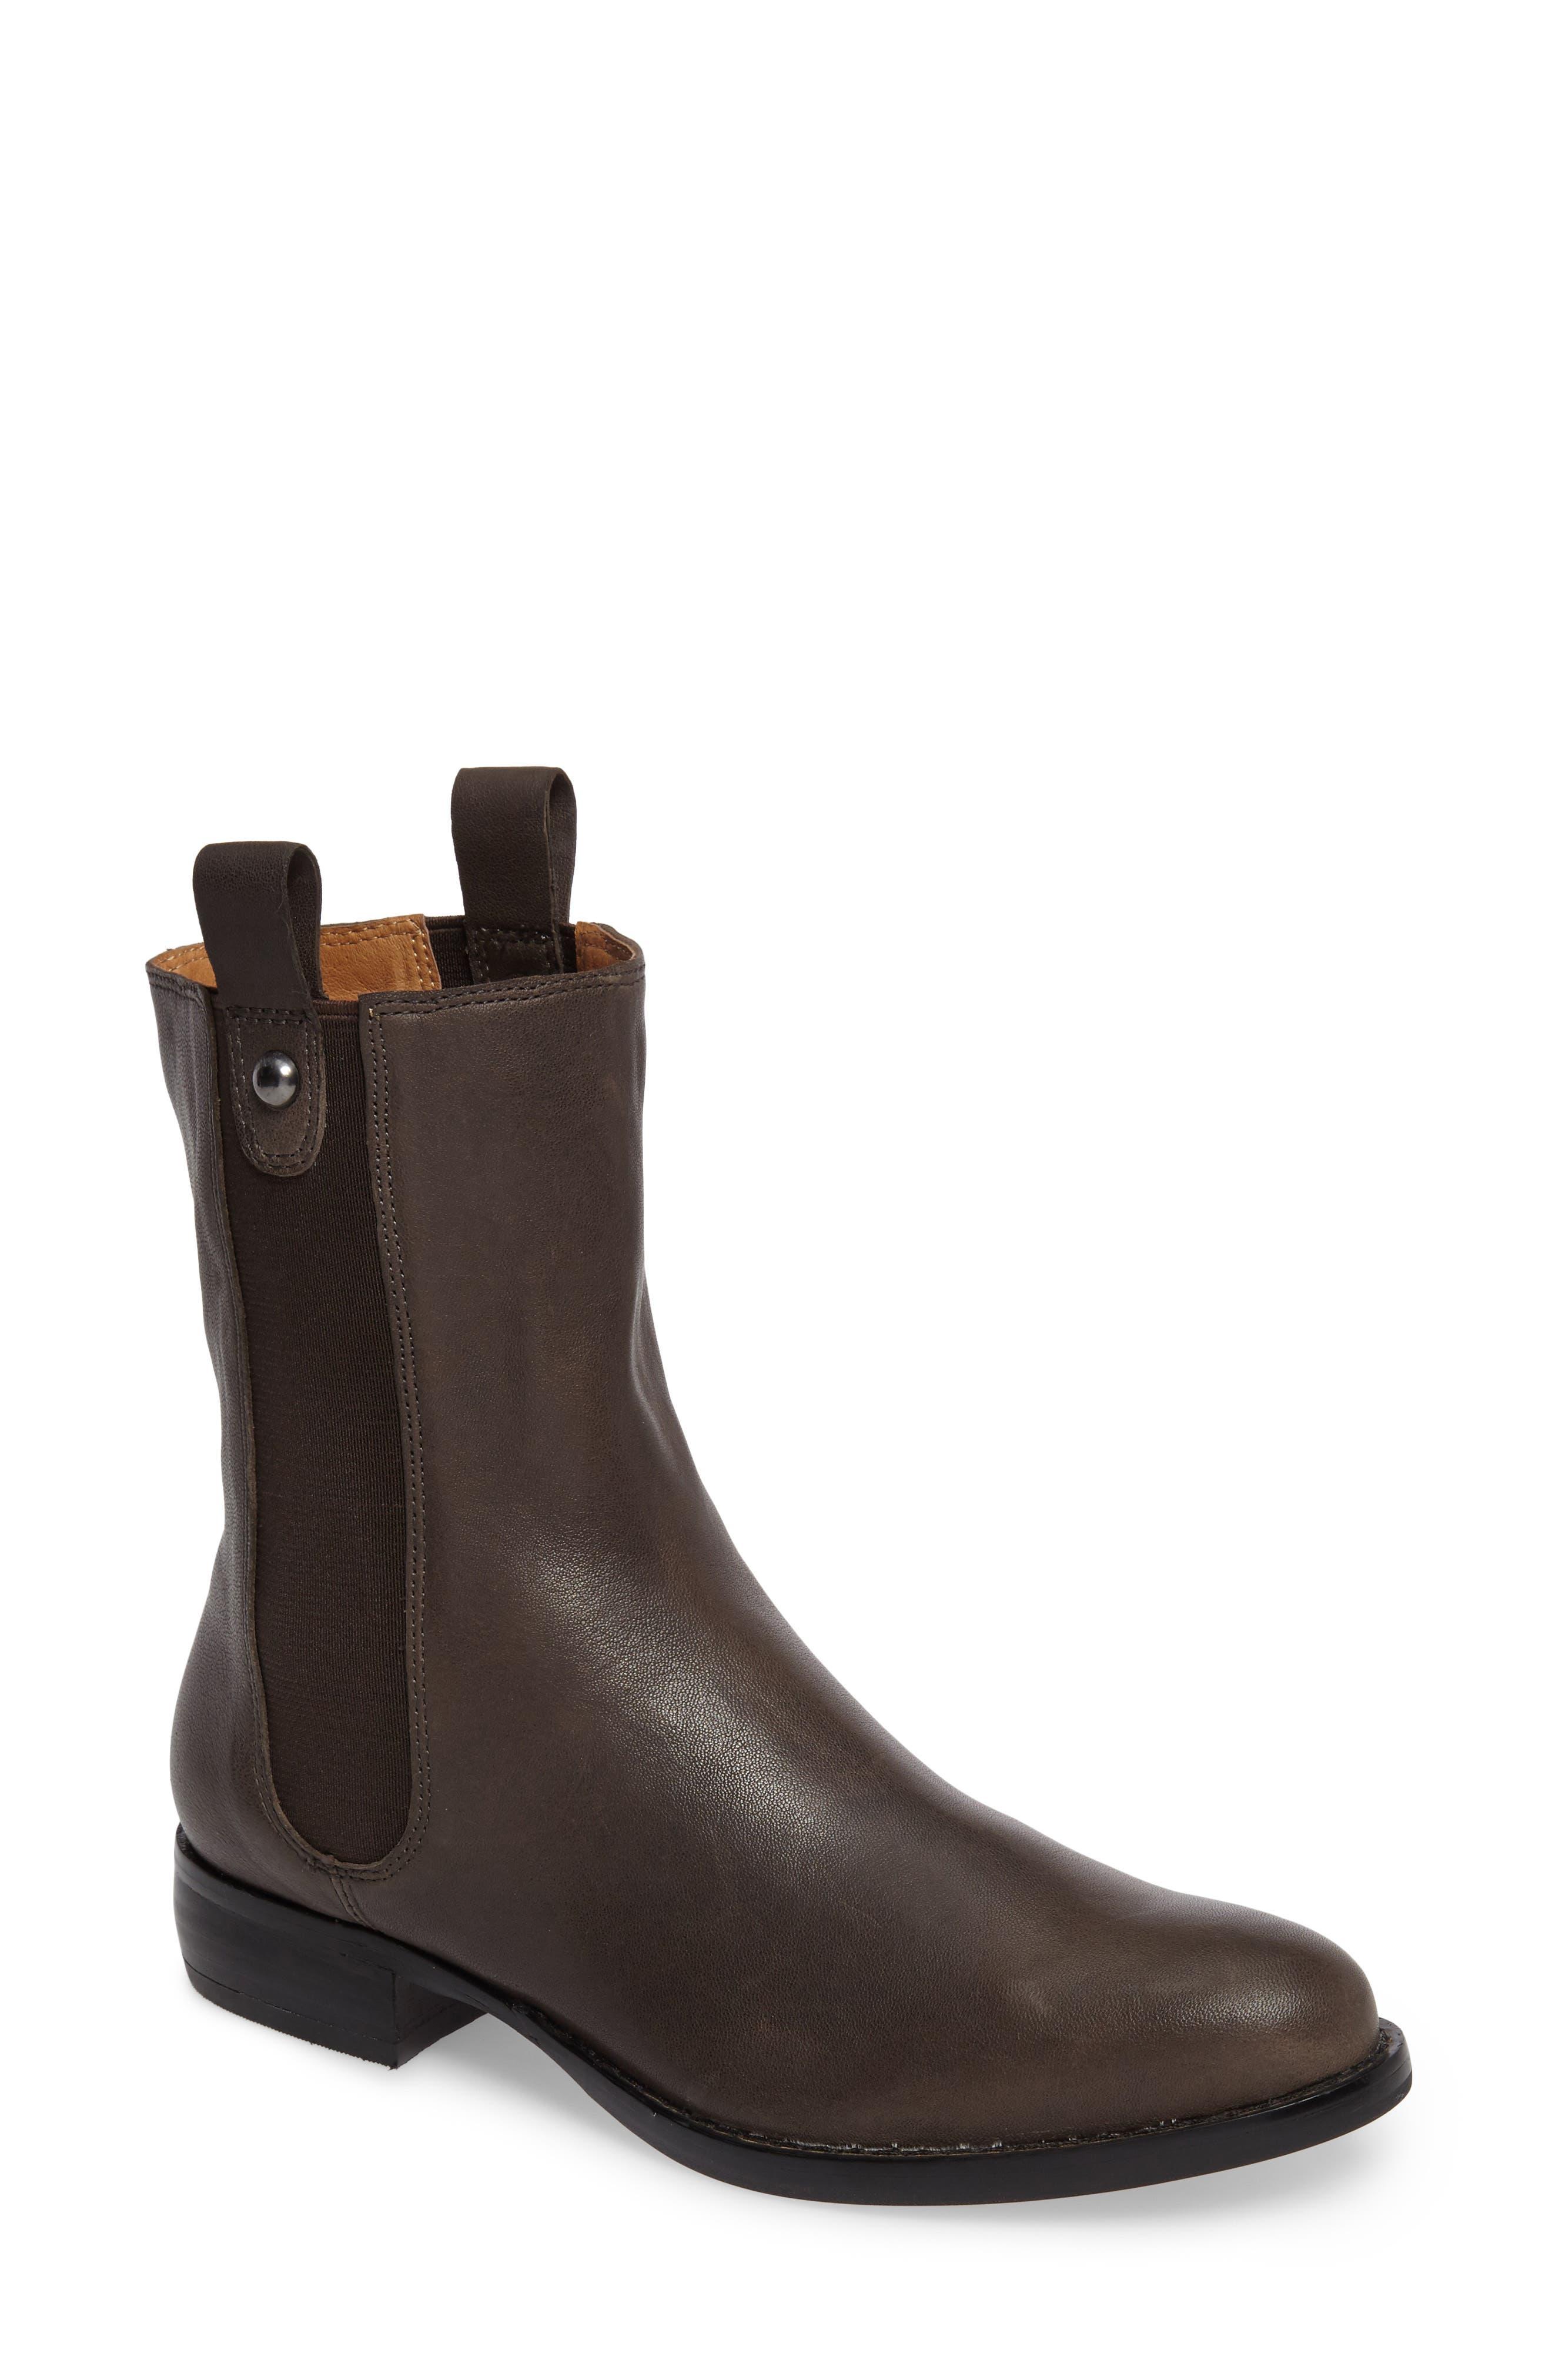 CC Corso Como Armando Boot,                         Main,                         color, Dark Grey Leather